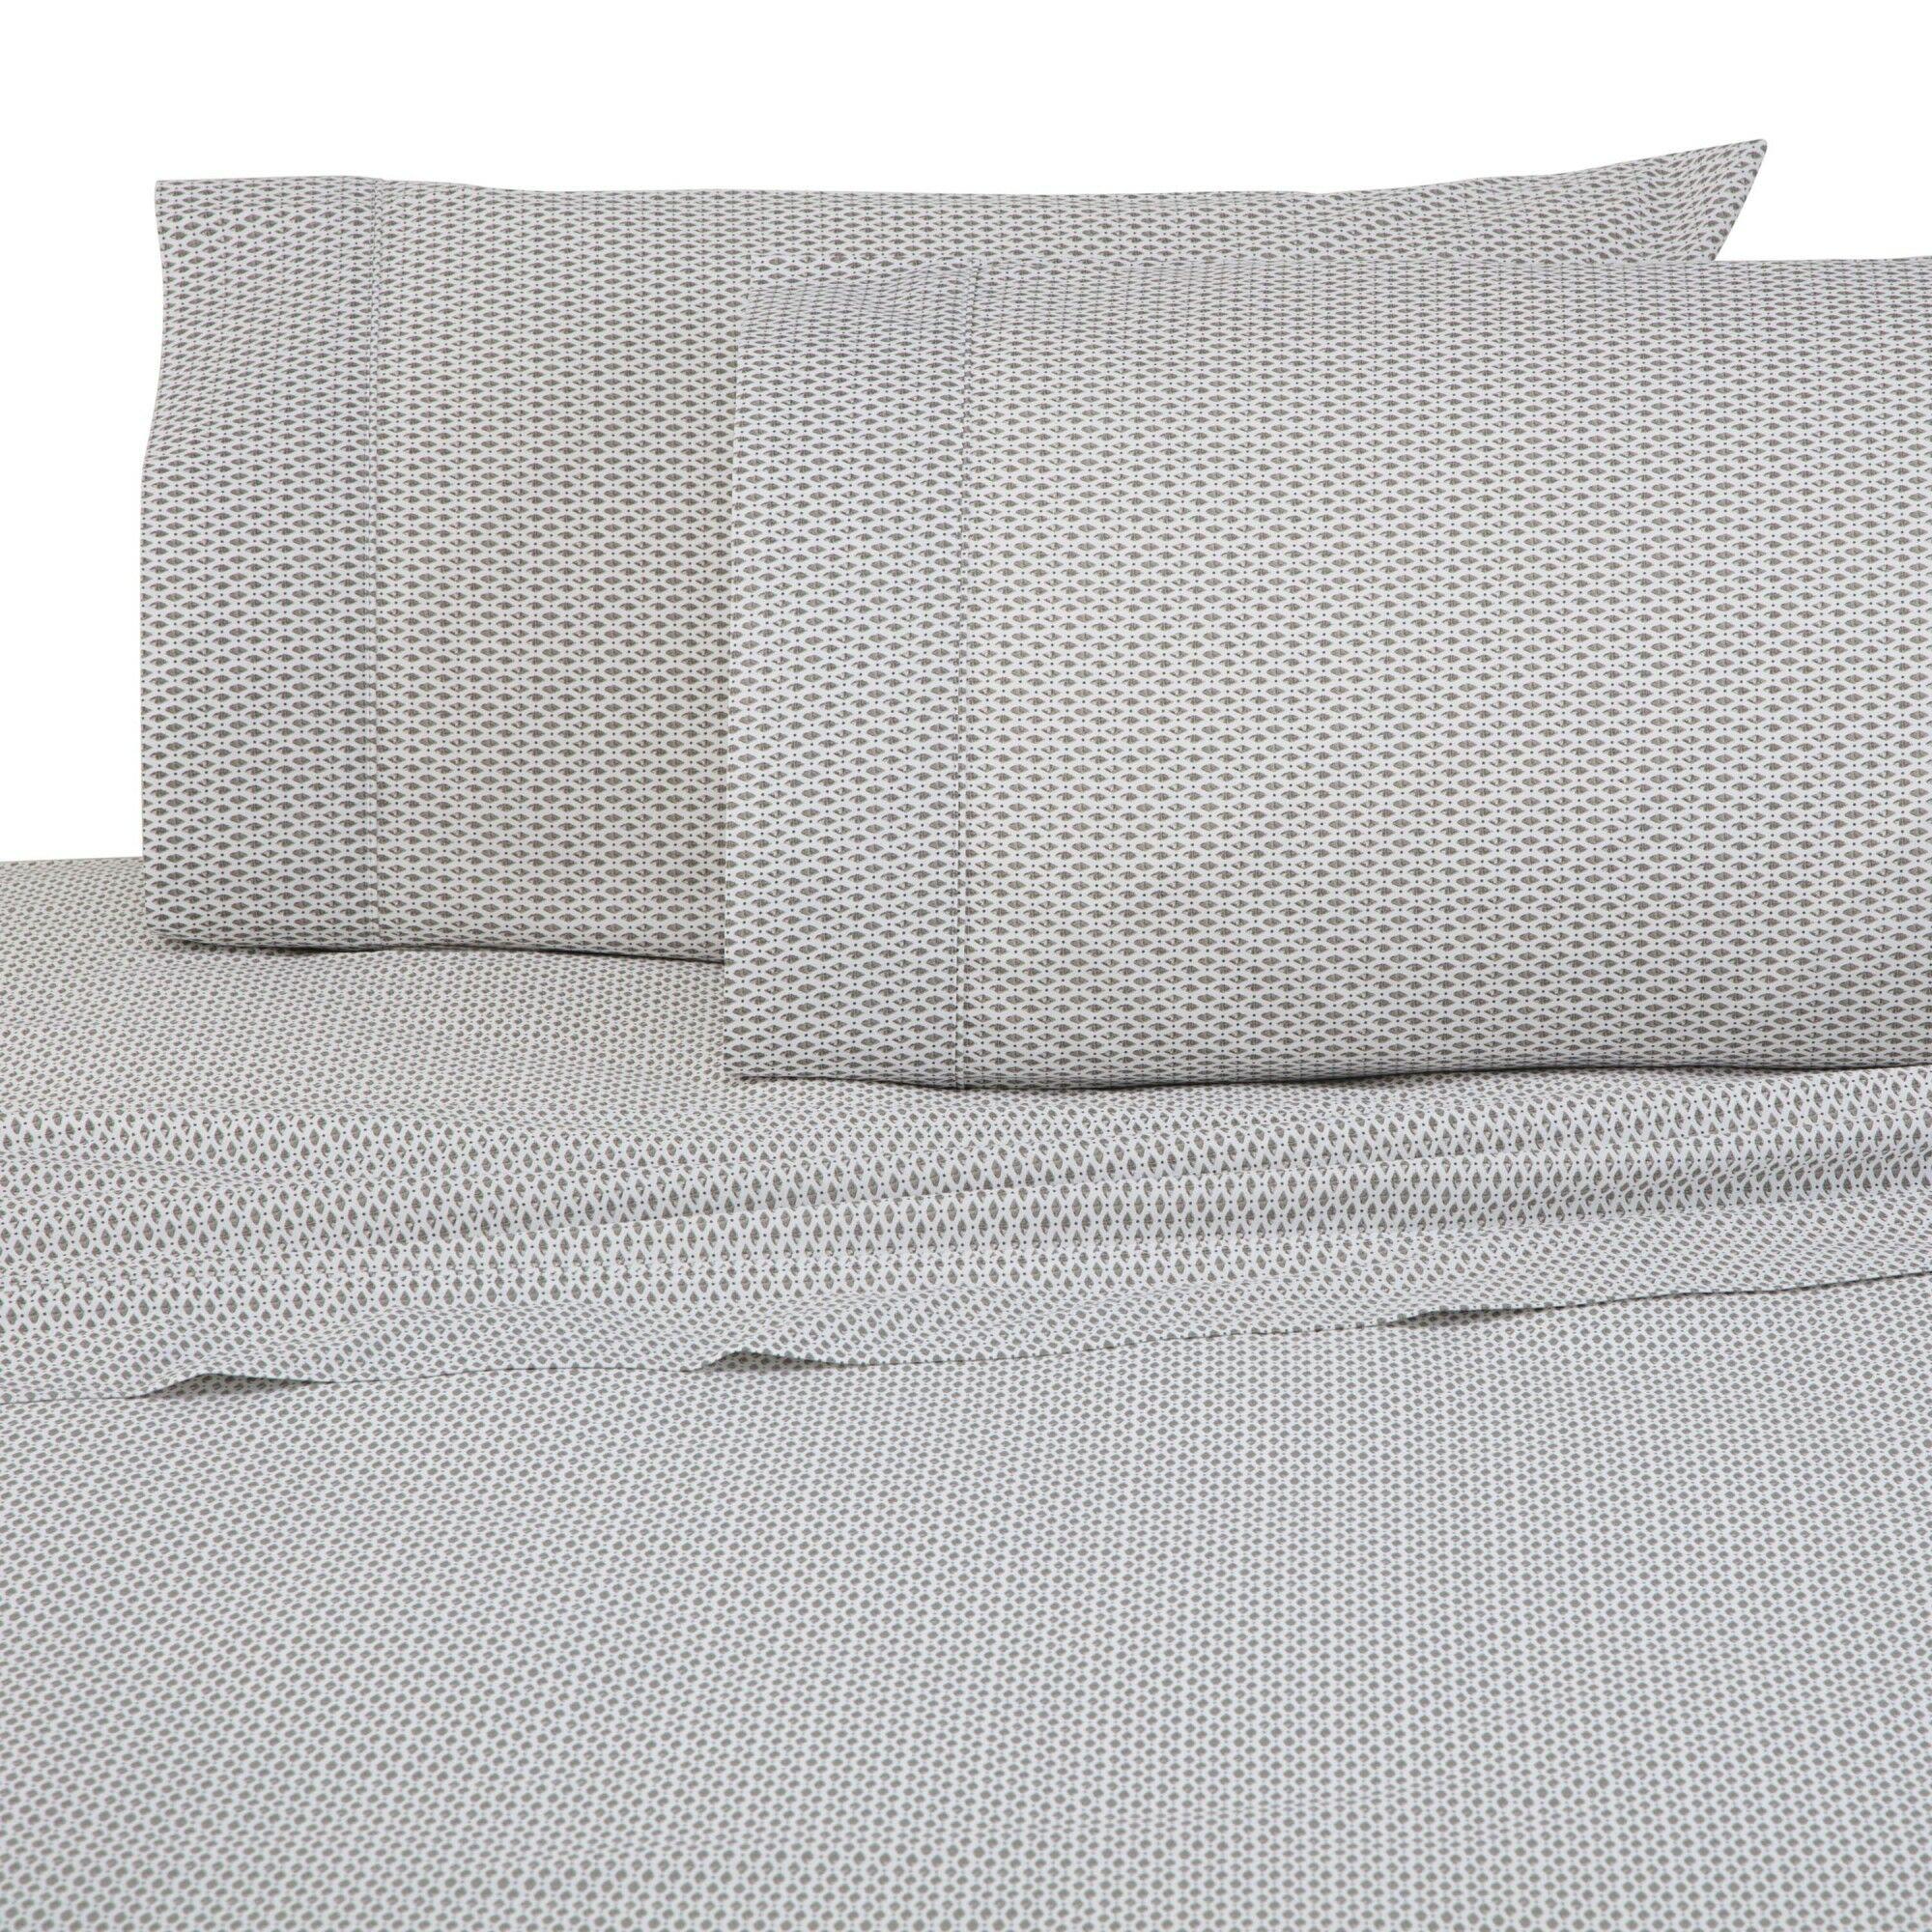 Siesta 300 Thread Count 100% Cotton Sheet Set Size: King